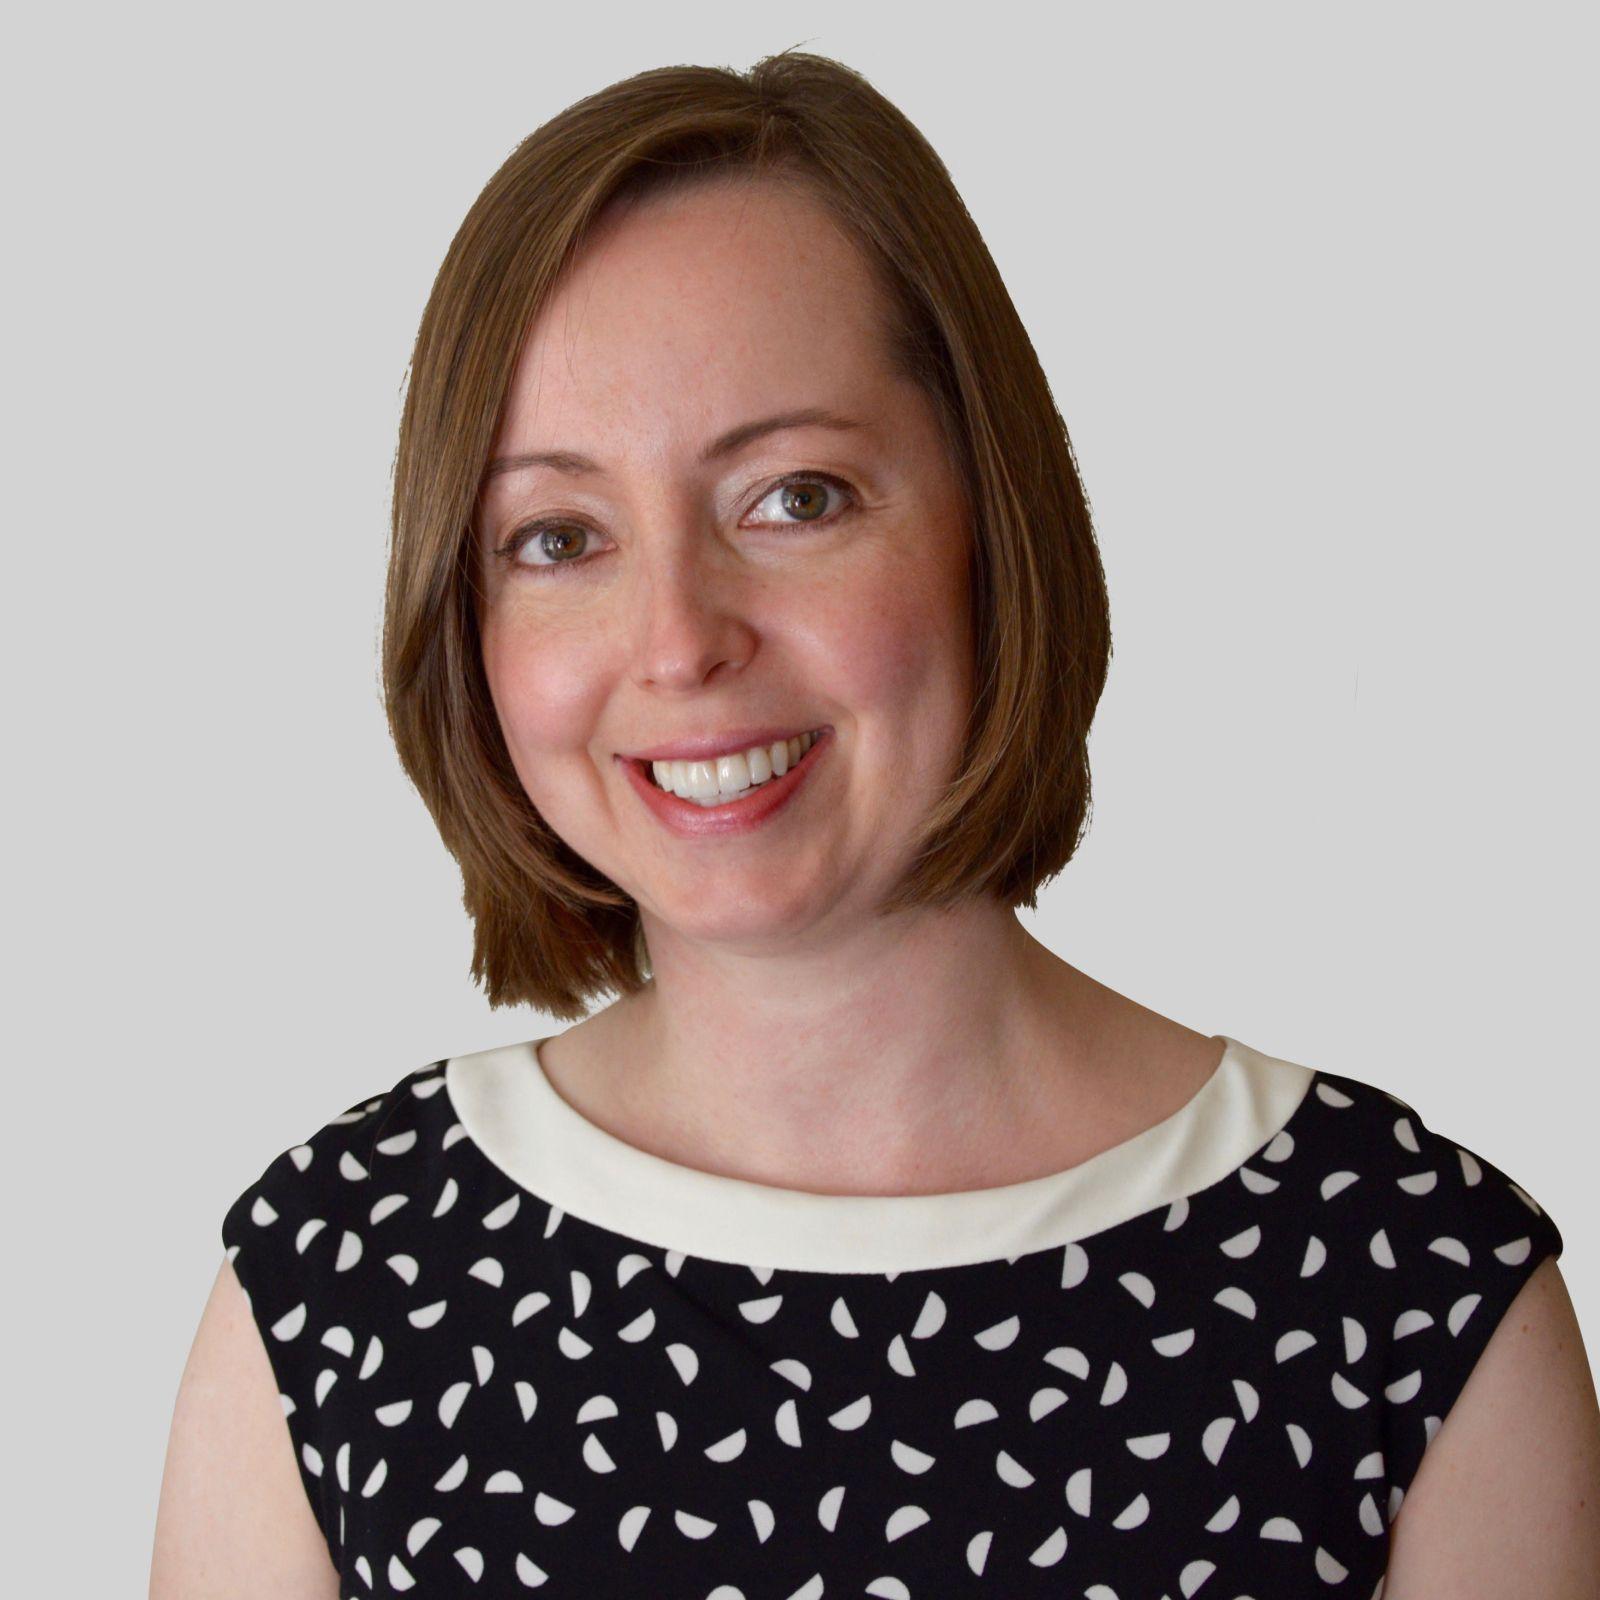 Allison Siebern, PhD, CBSM | Proper